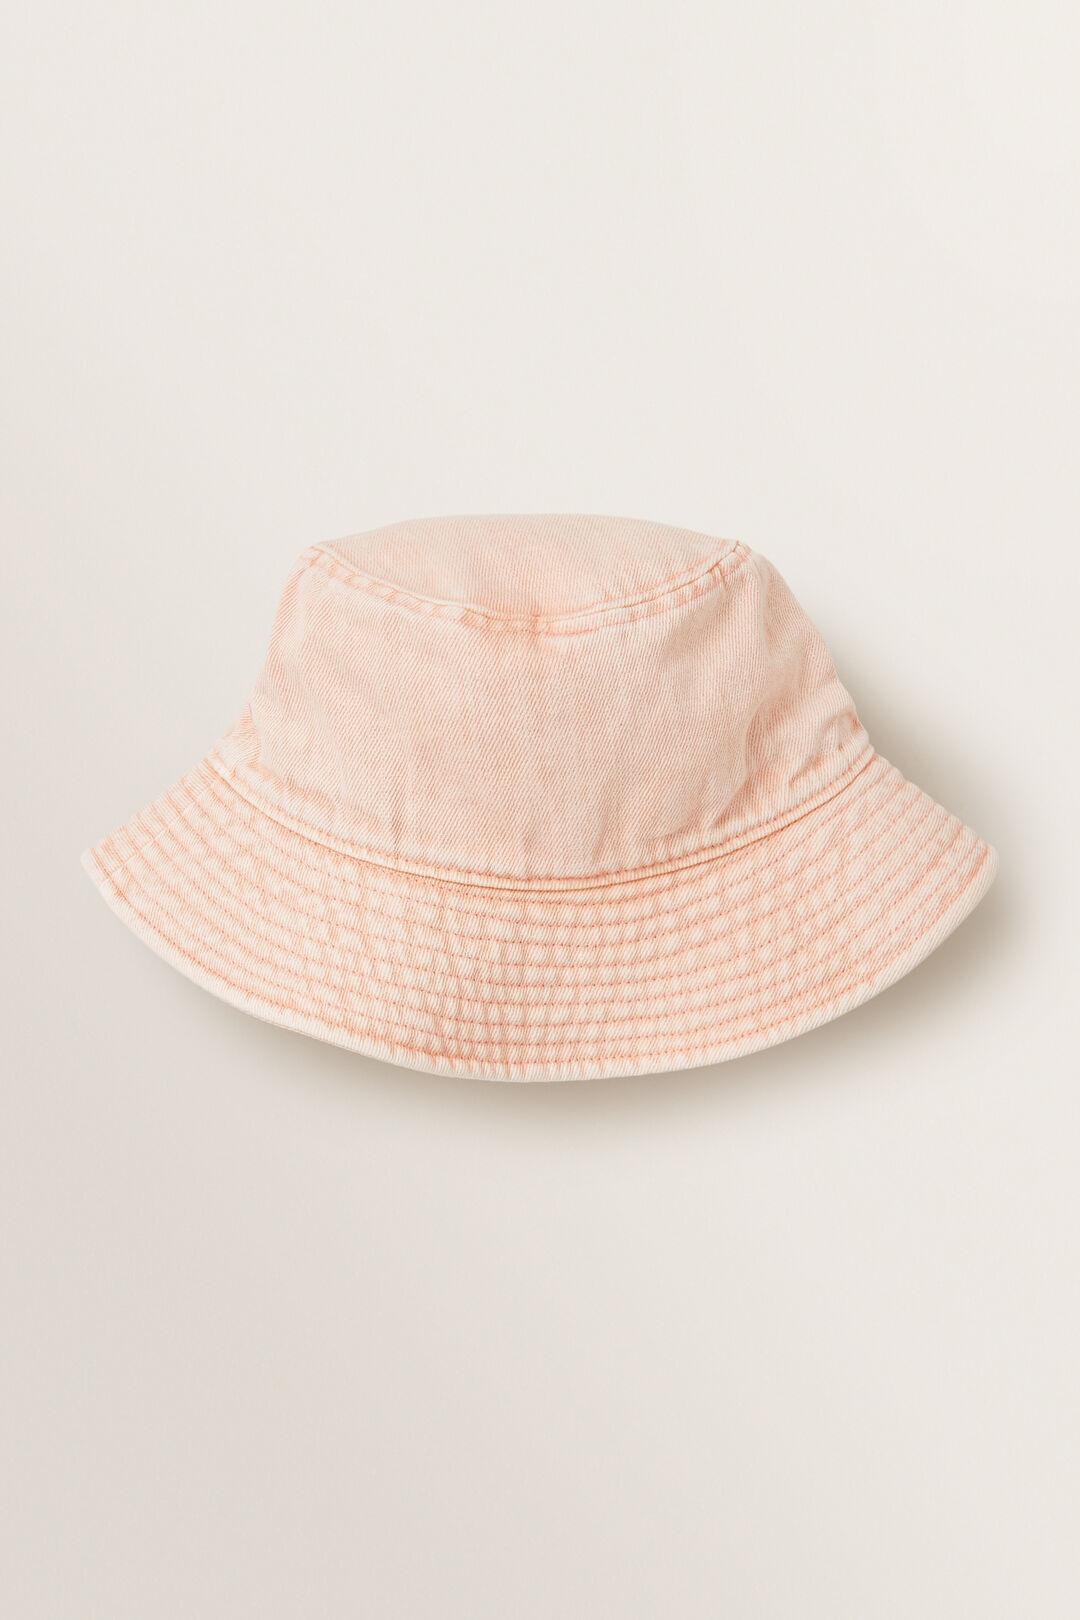 Acid Wash Bucket Hat  ACID WASH  hi-res